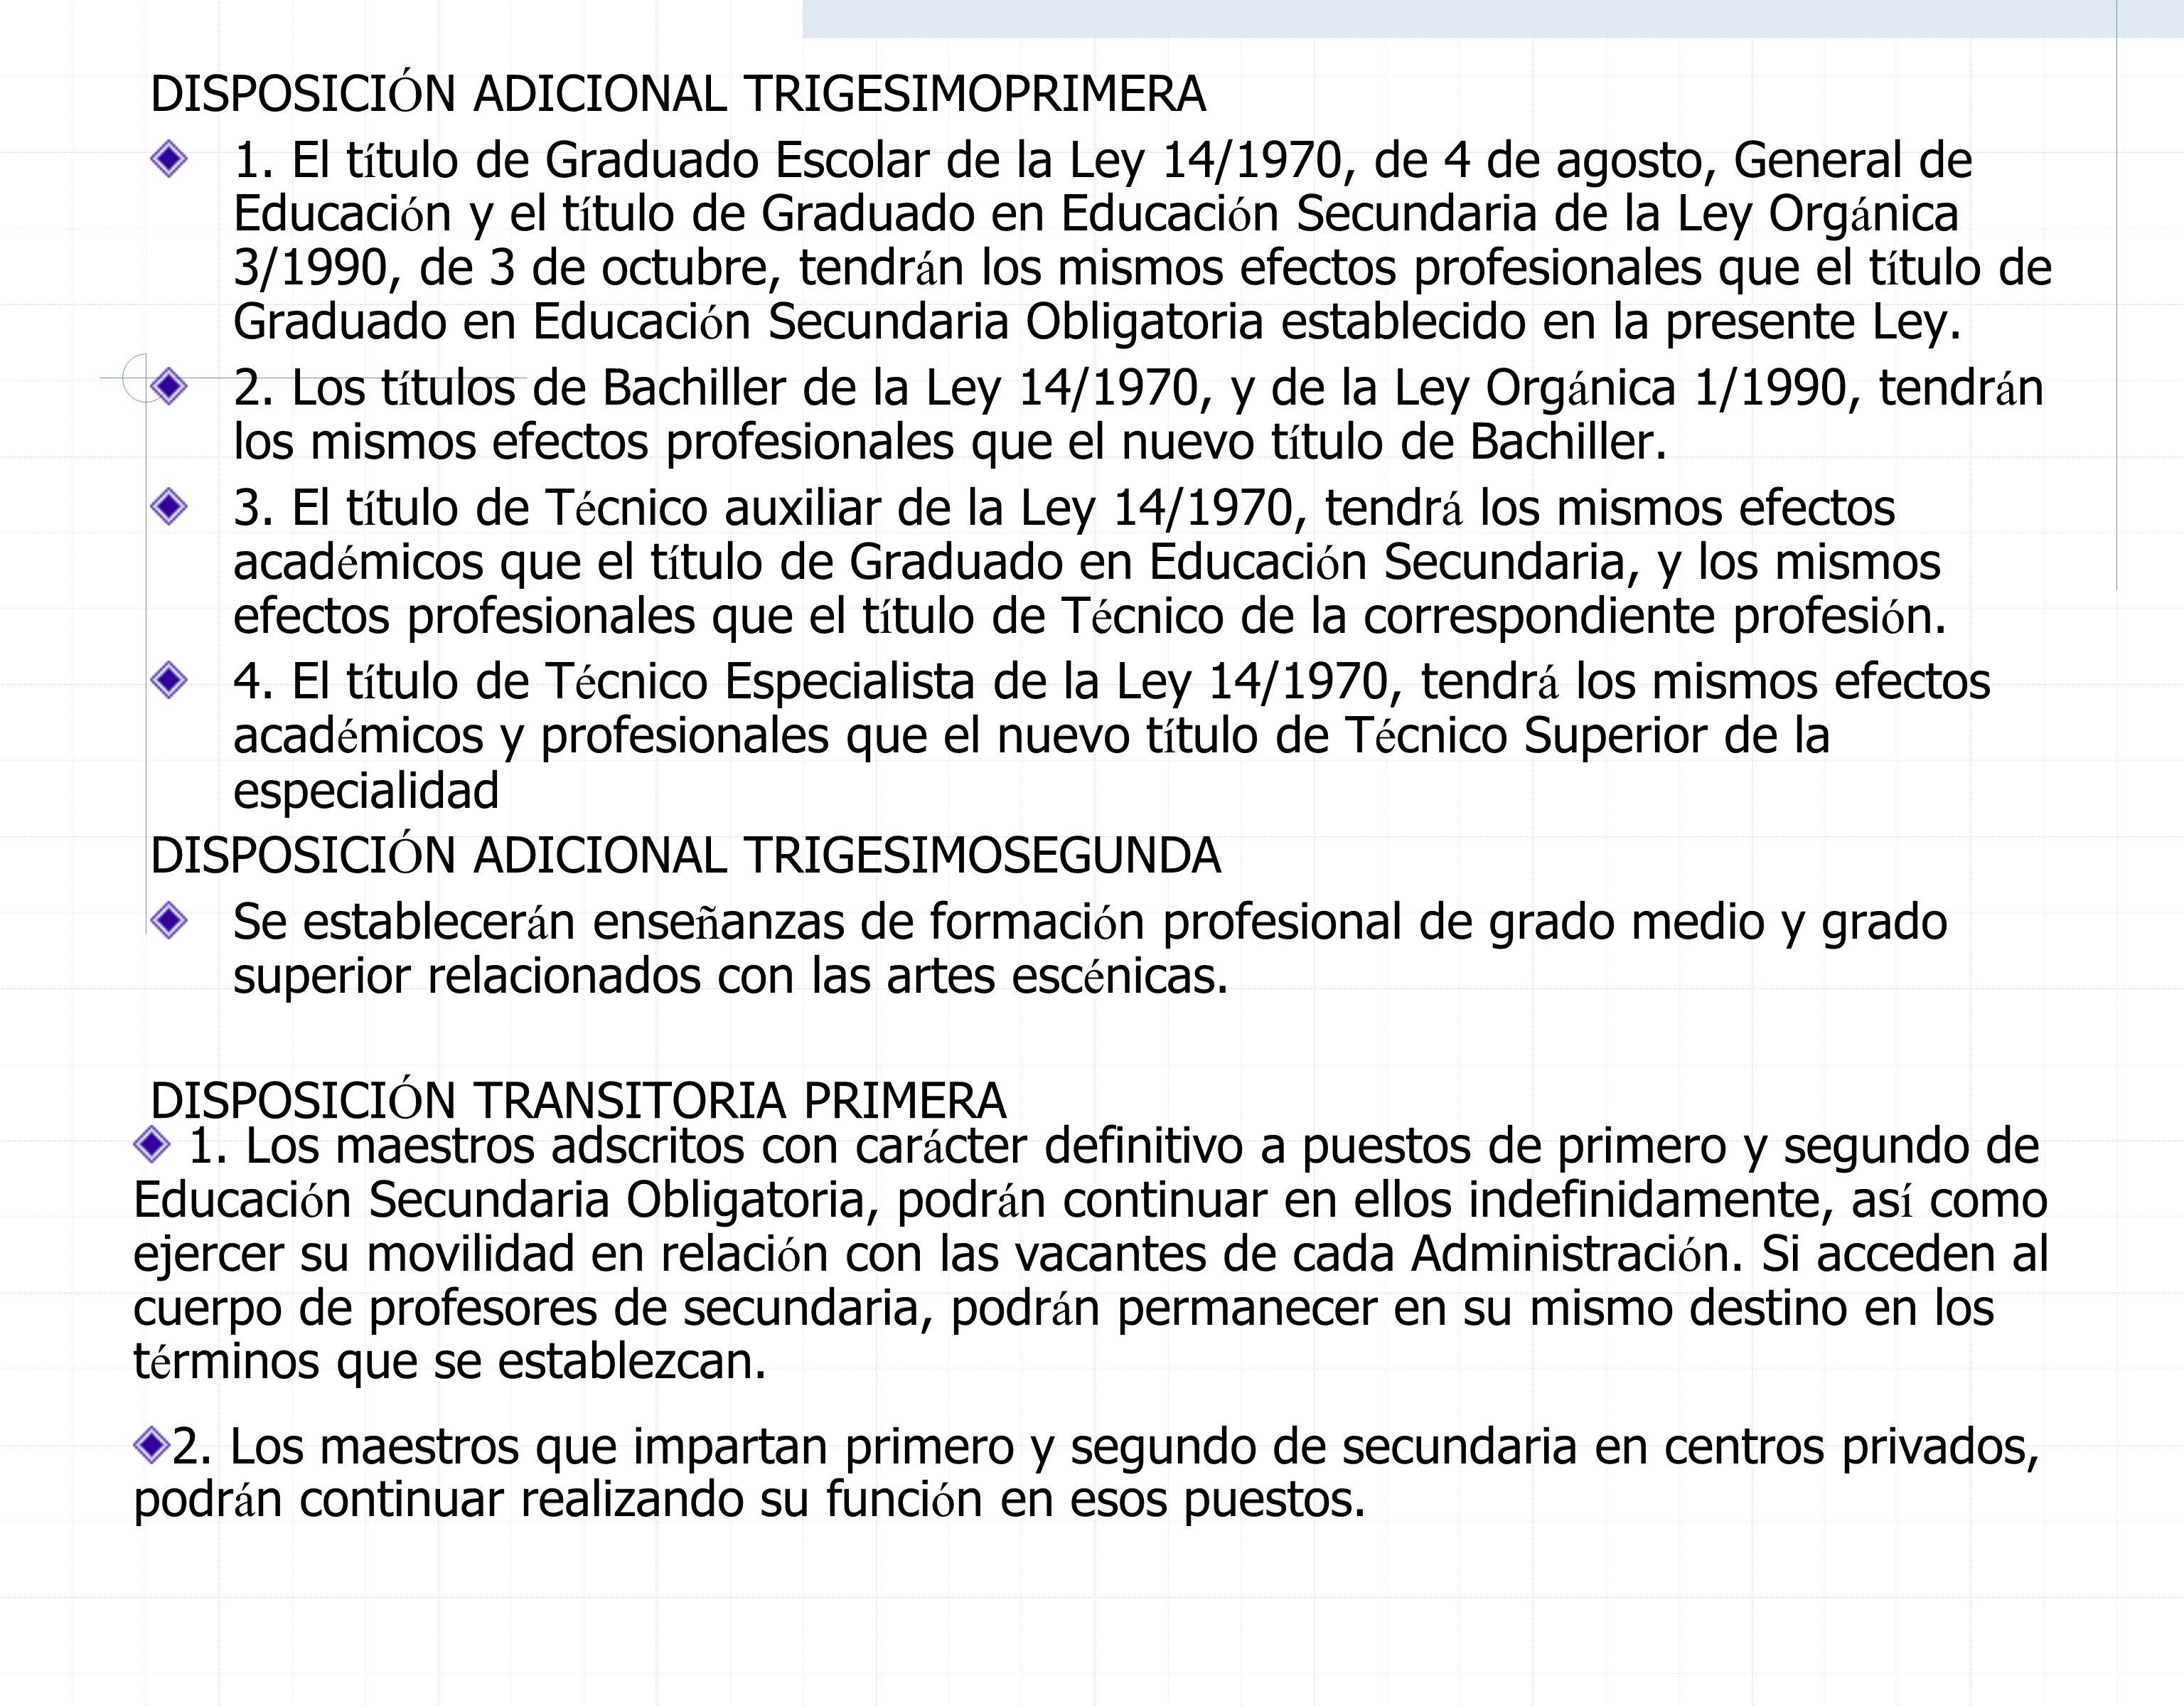 DISPOSICI Ó N TRANSITORIA SEGUNDA 1.